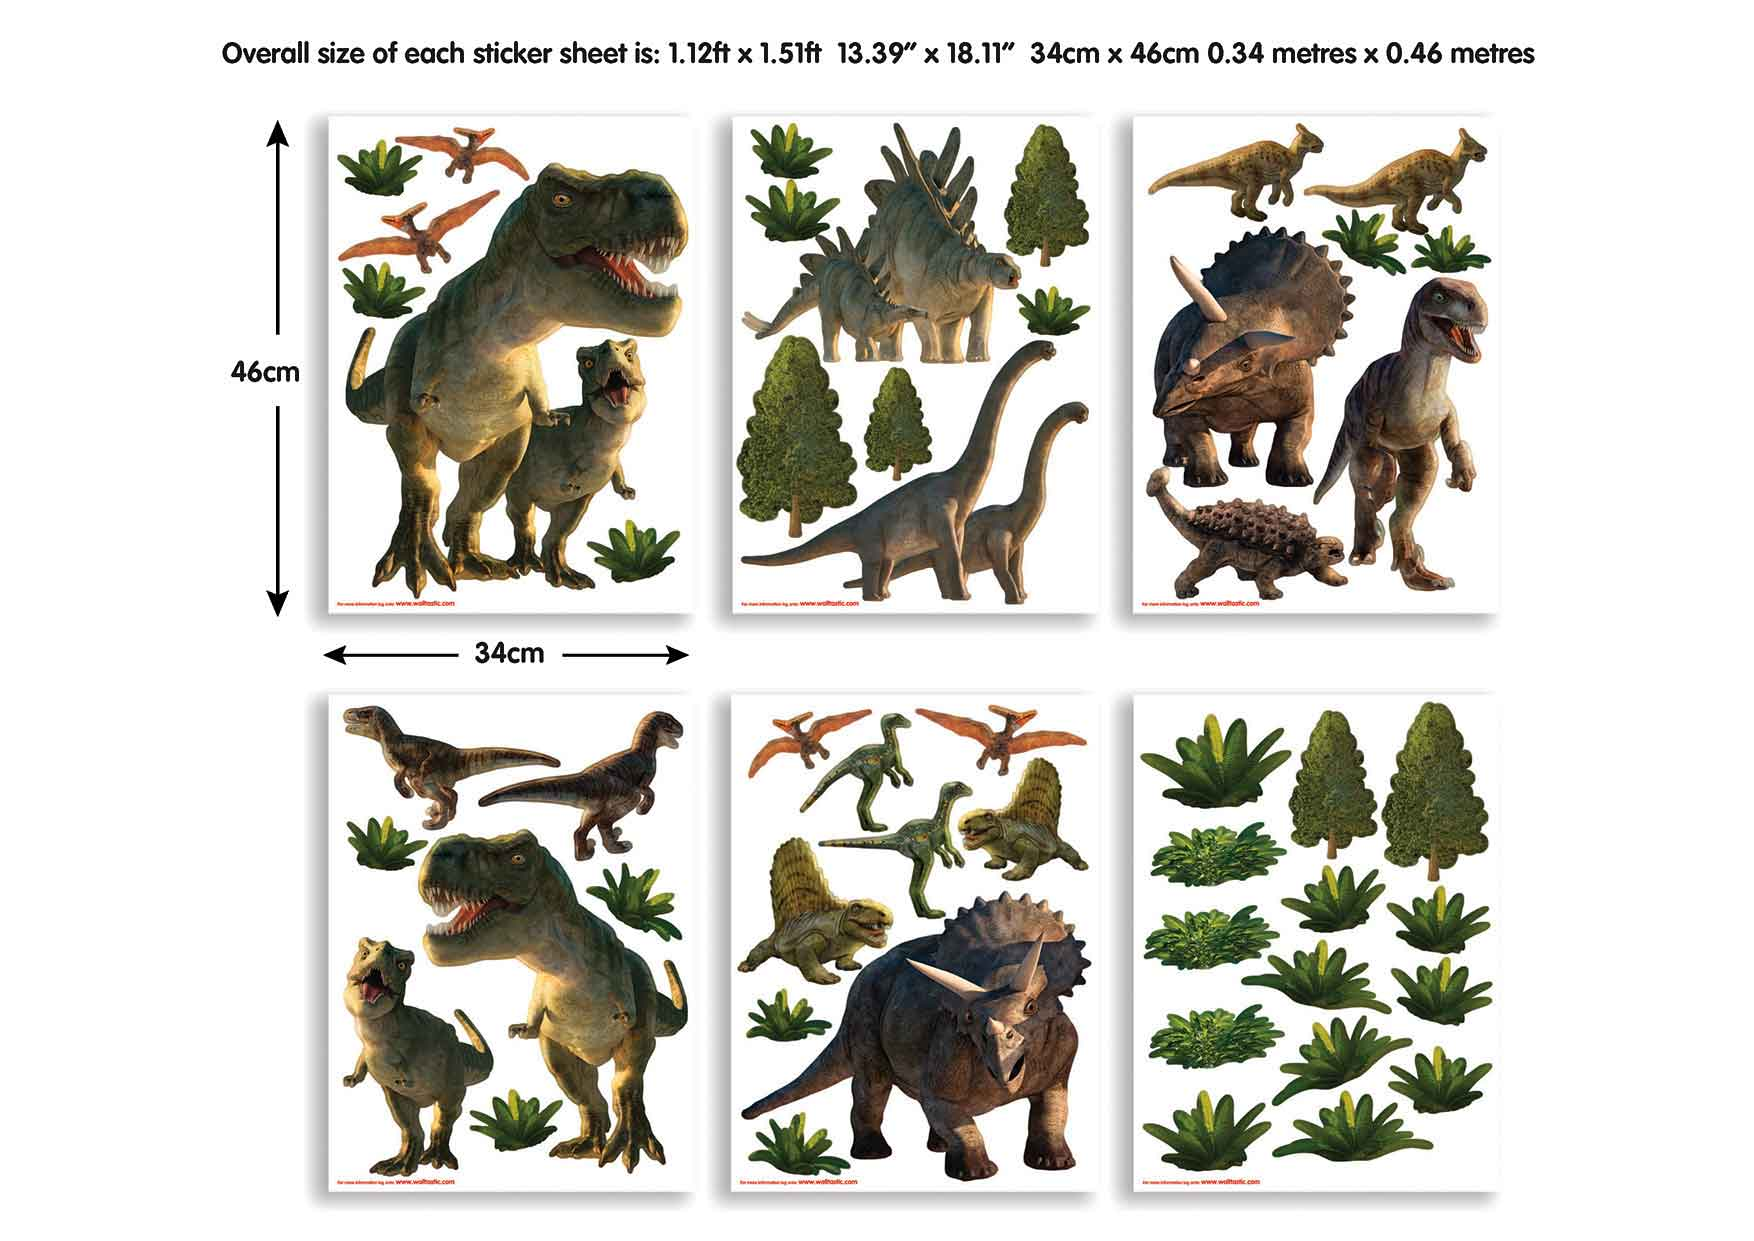 Wandtattoo dinosaurier triceratops walltastic wandsticker - Wandtattoo dino ...